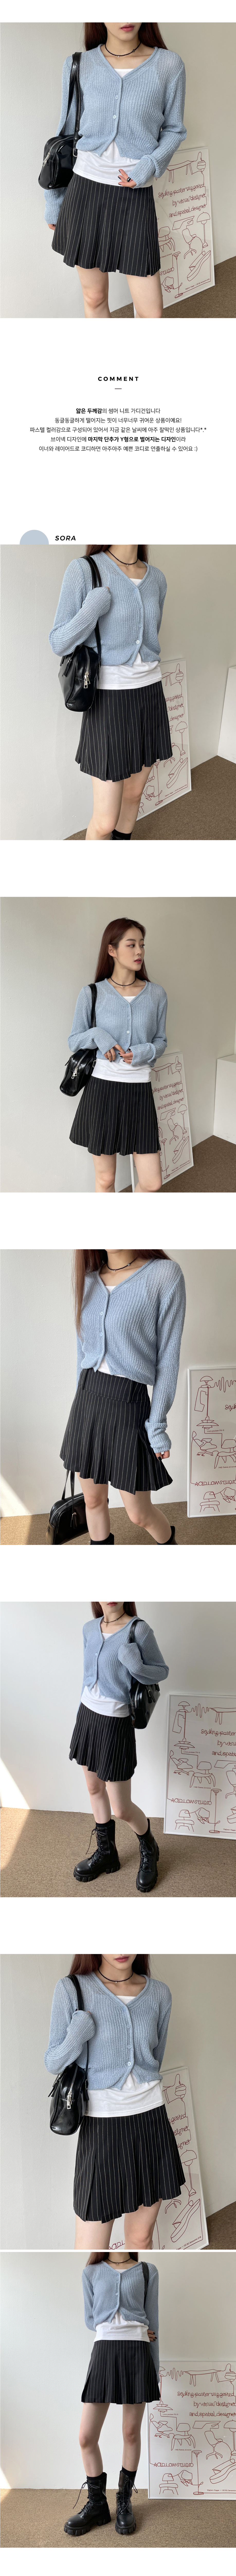 Dongle V-Neck Summer Knitwear Cardigan